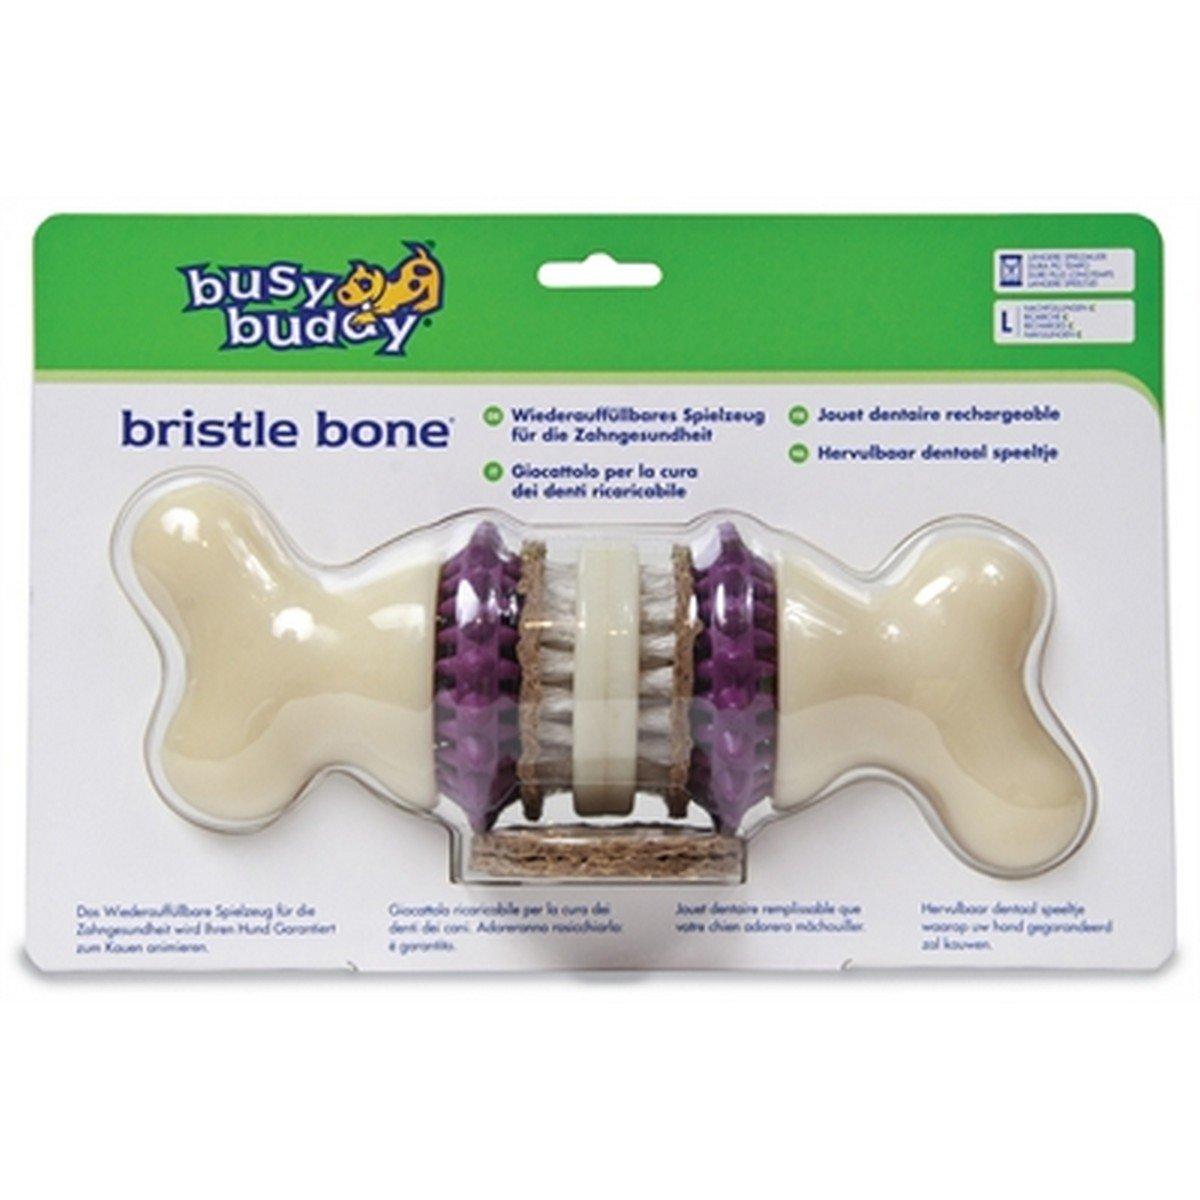 Afbeelding van Busy Buddy Bristle Bone L